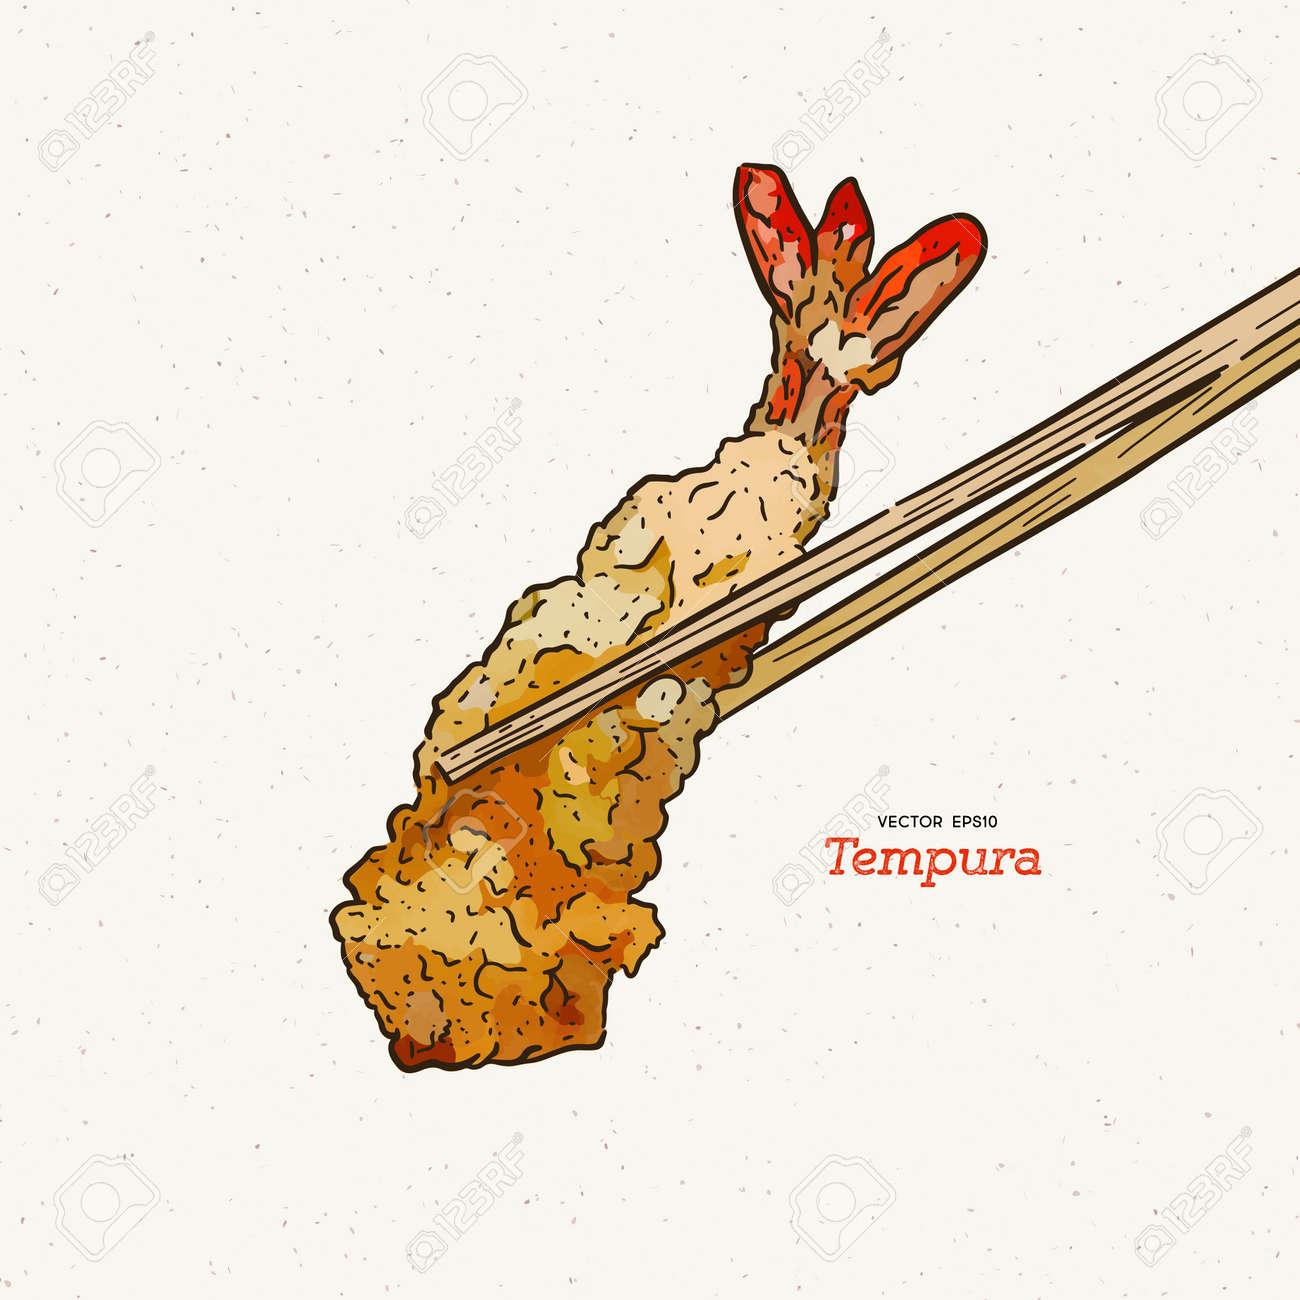 Illustration of a Pair of Chopsticks Holding a Piece of Tempura - 165340408